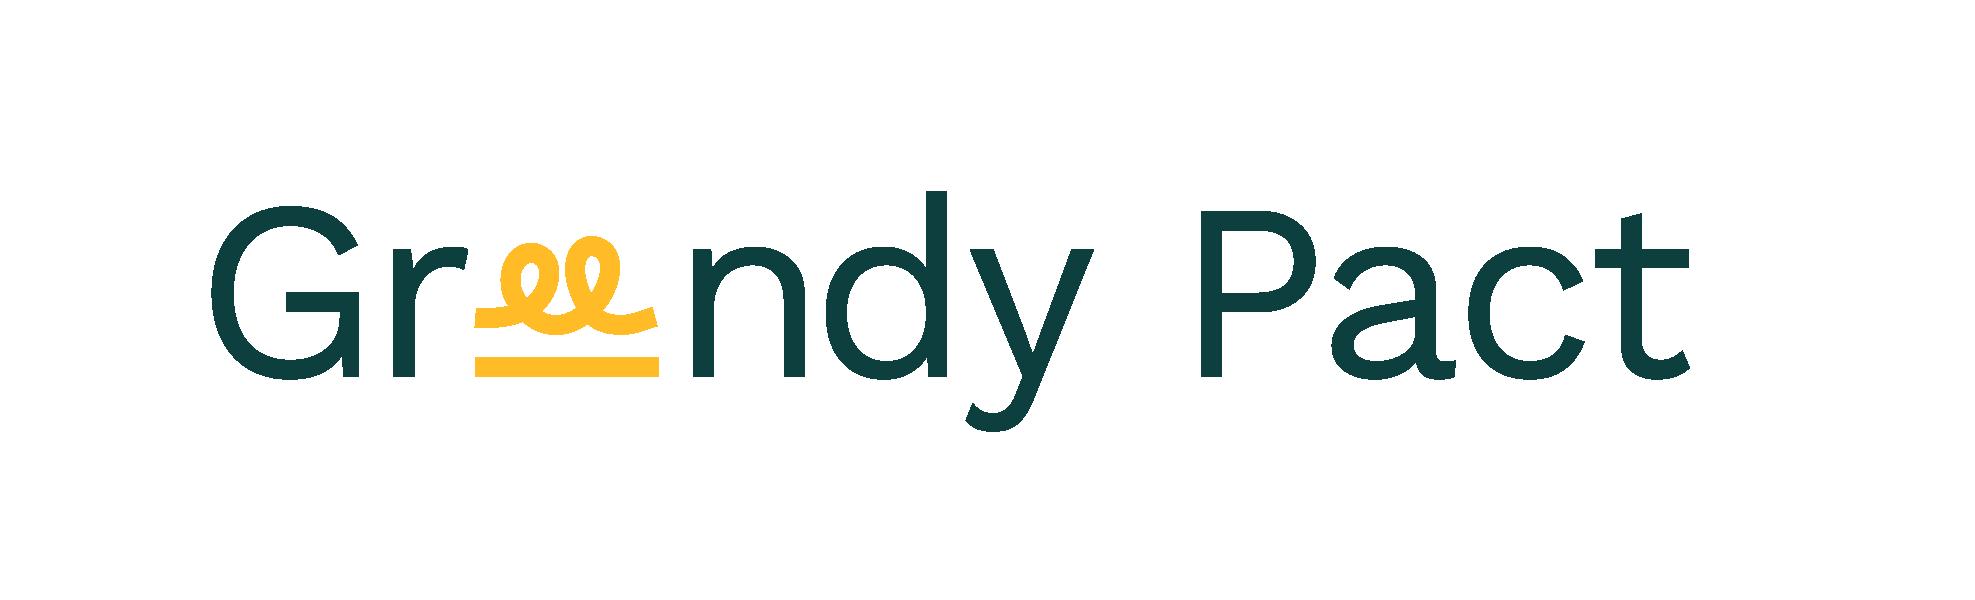 GreendyPact - Logo